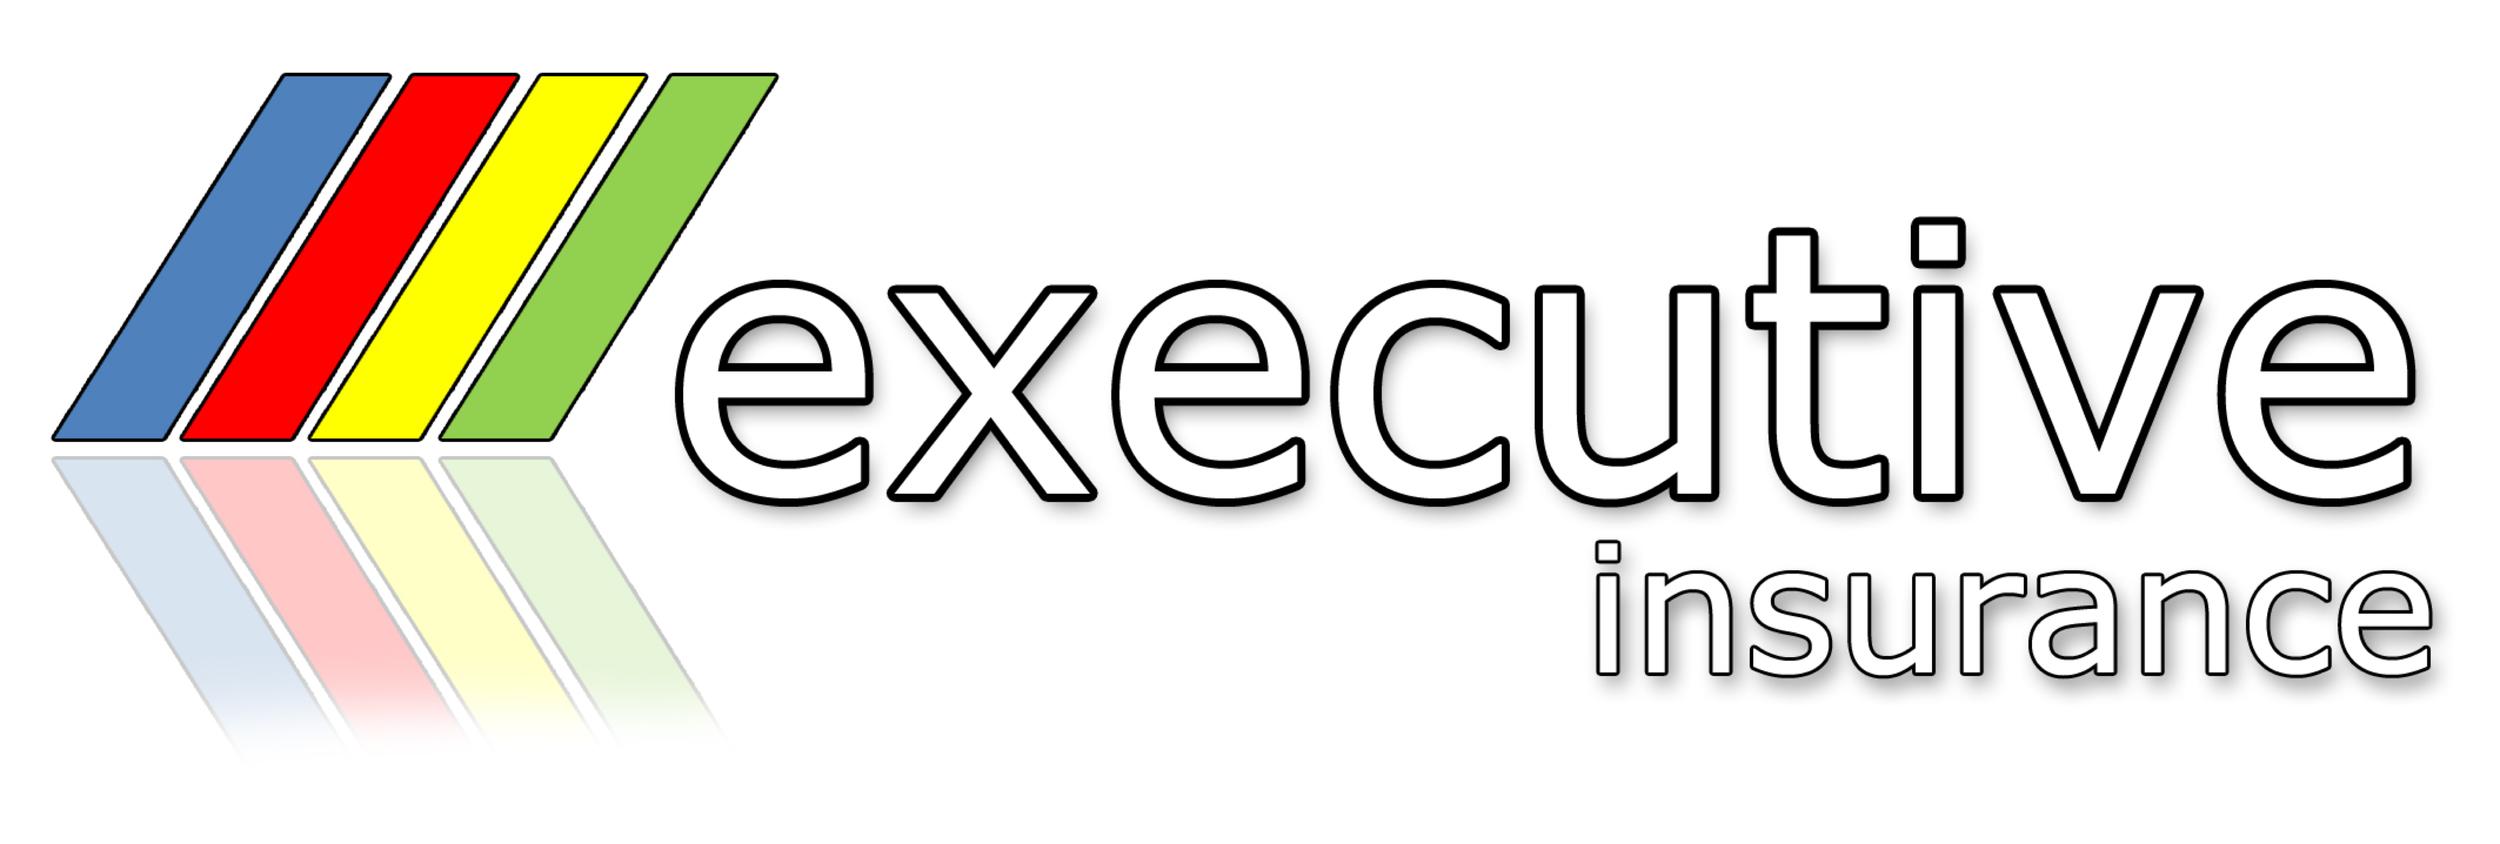 Mid Executiveinsurance